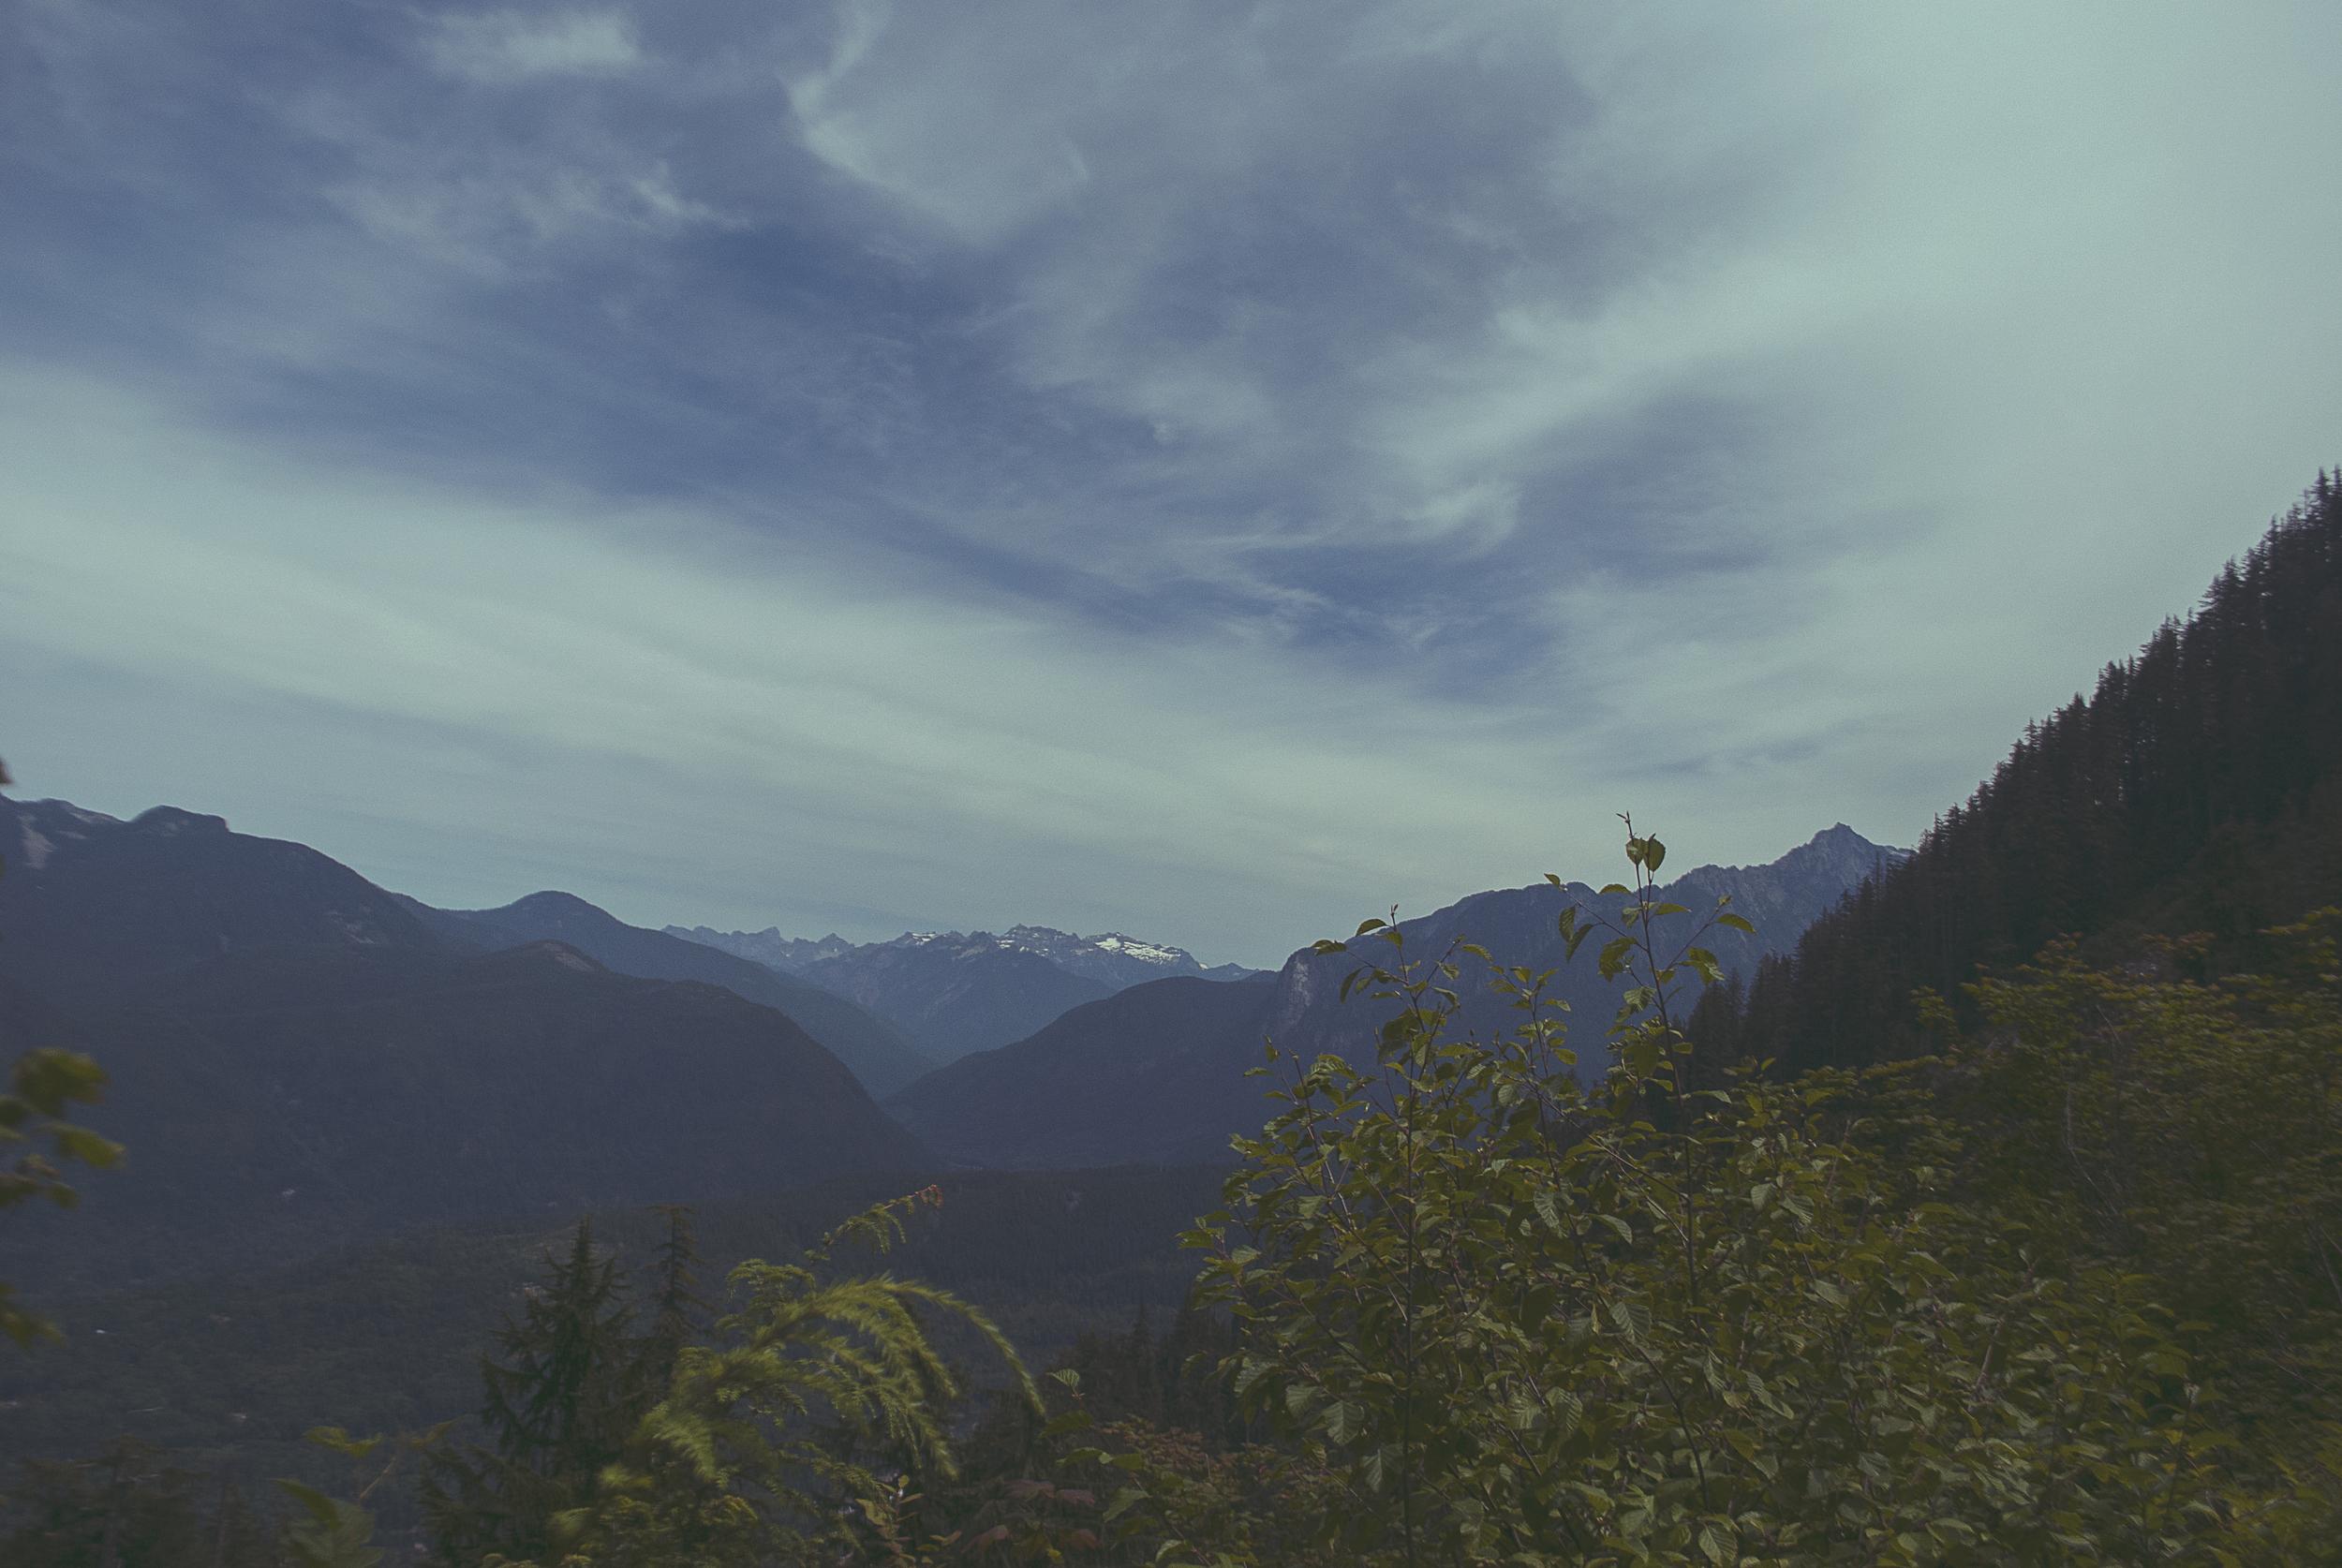 Seattle_mountain_distanceView_DSC0210.jpg